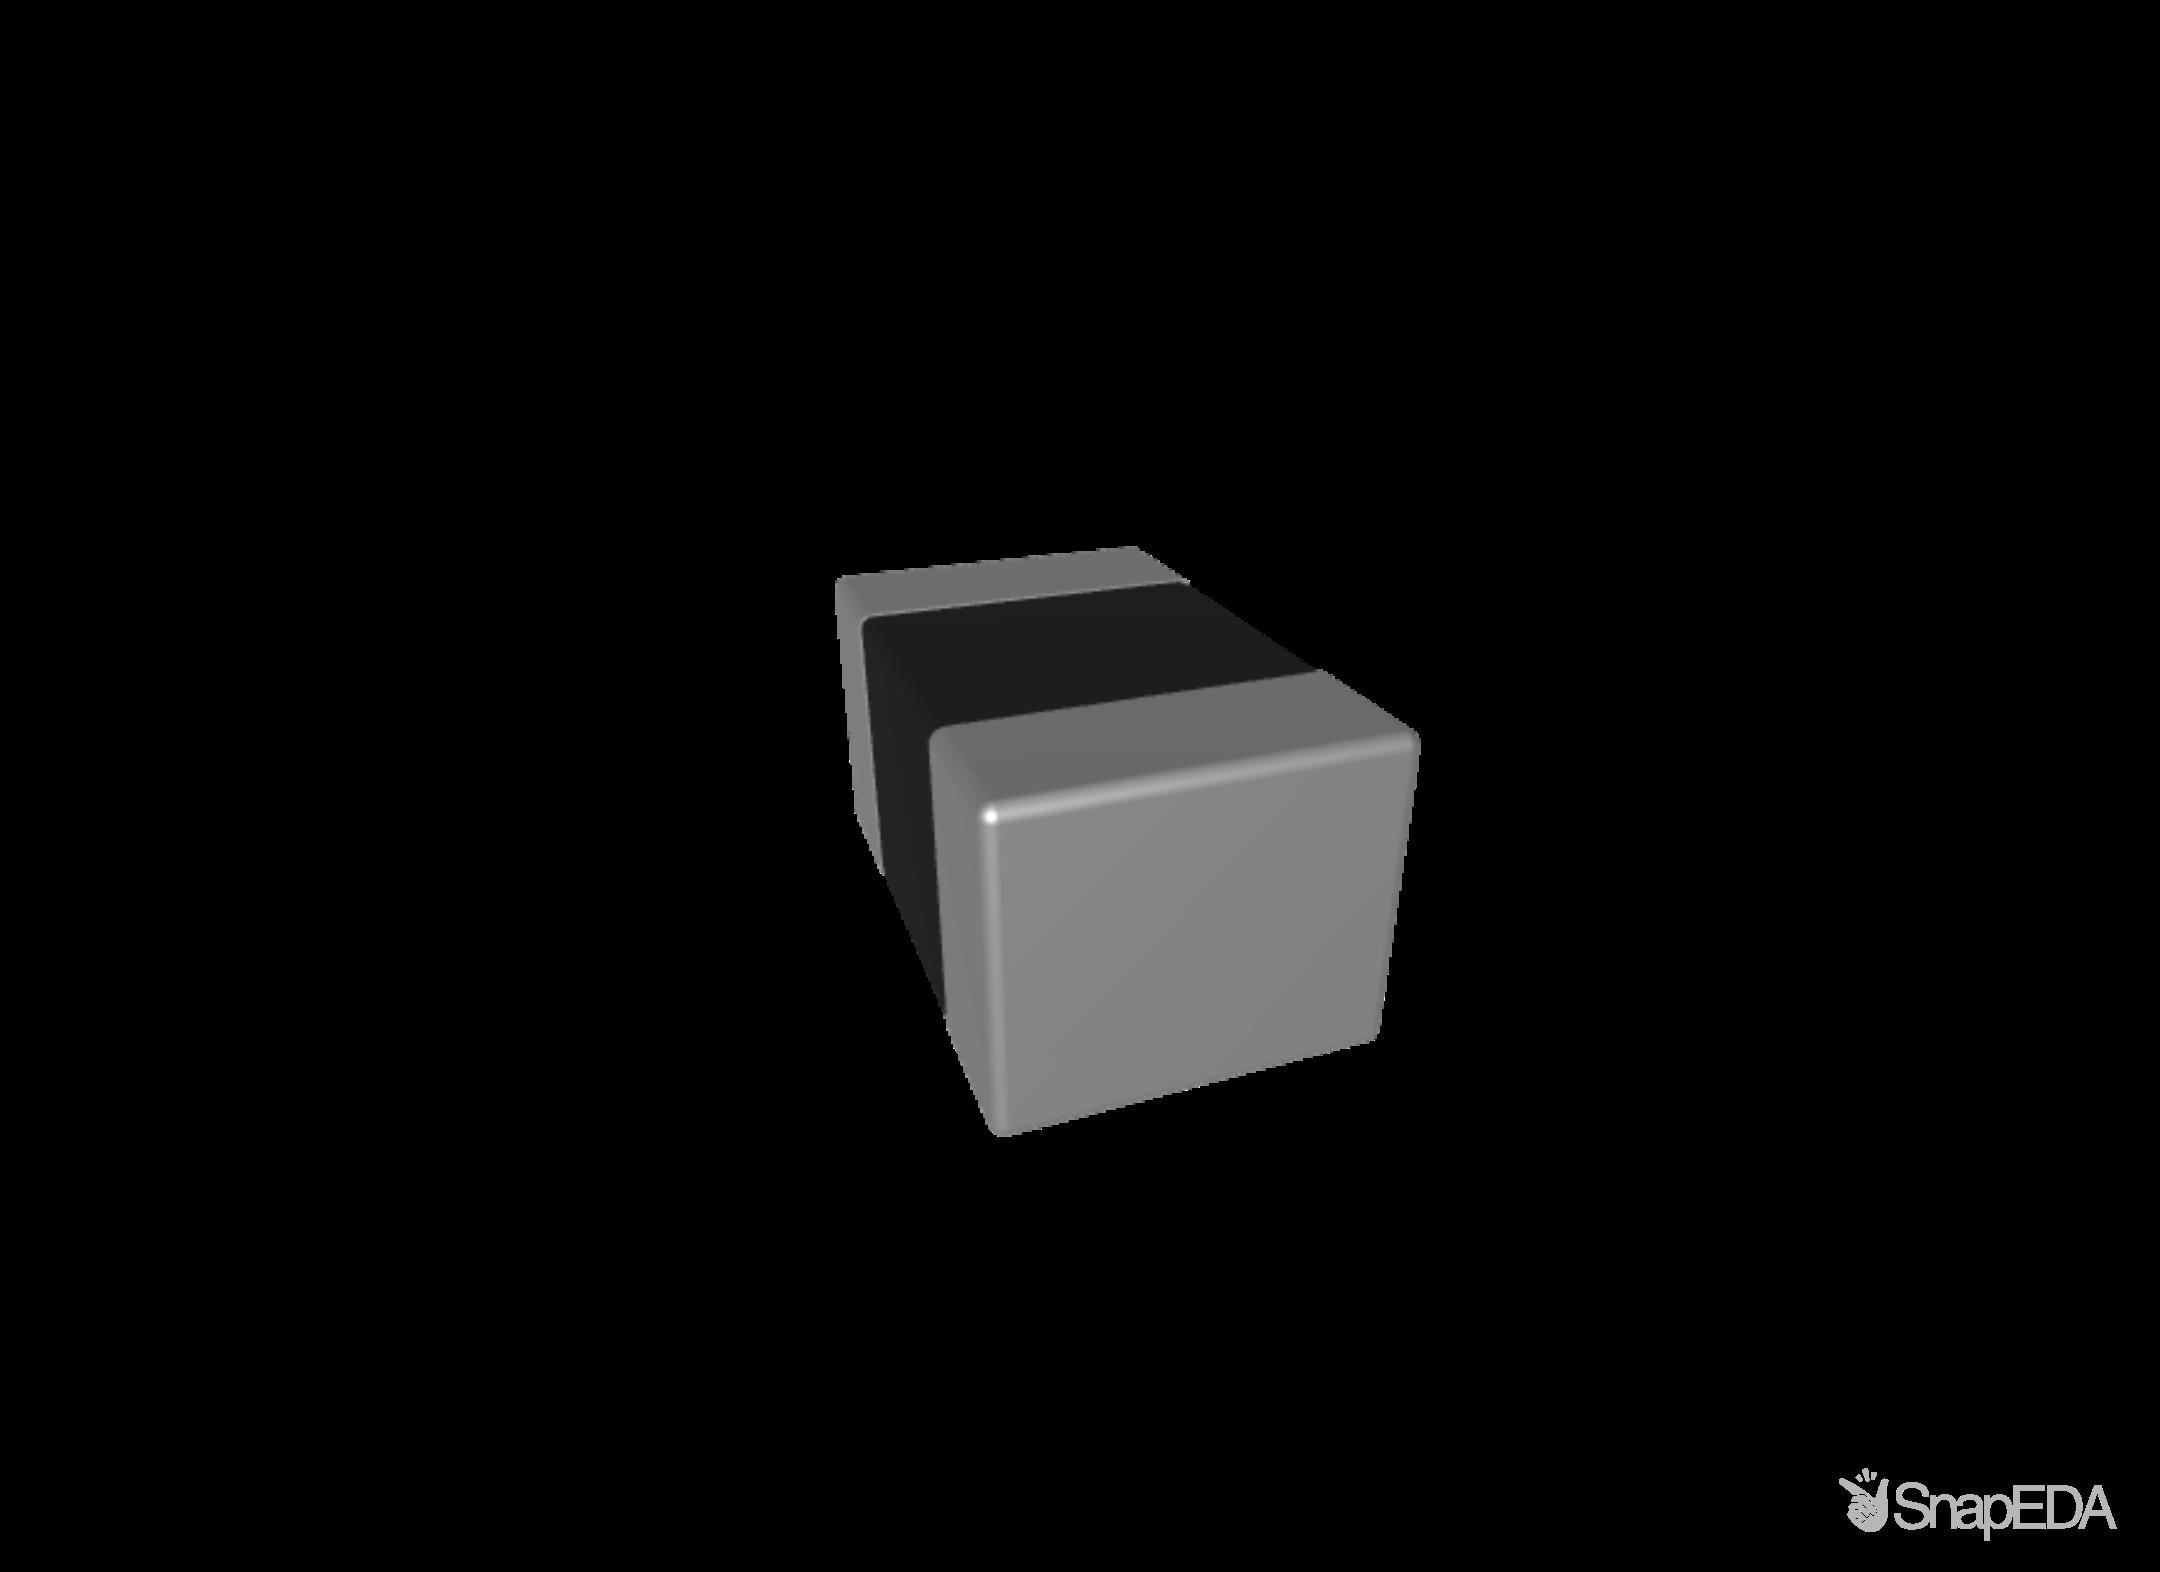 MLP2012H2R2MT0S1 3D Model